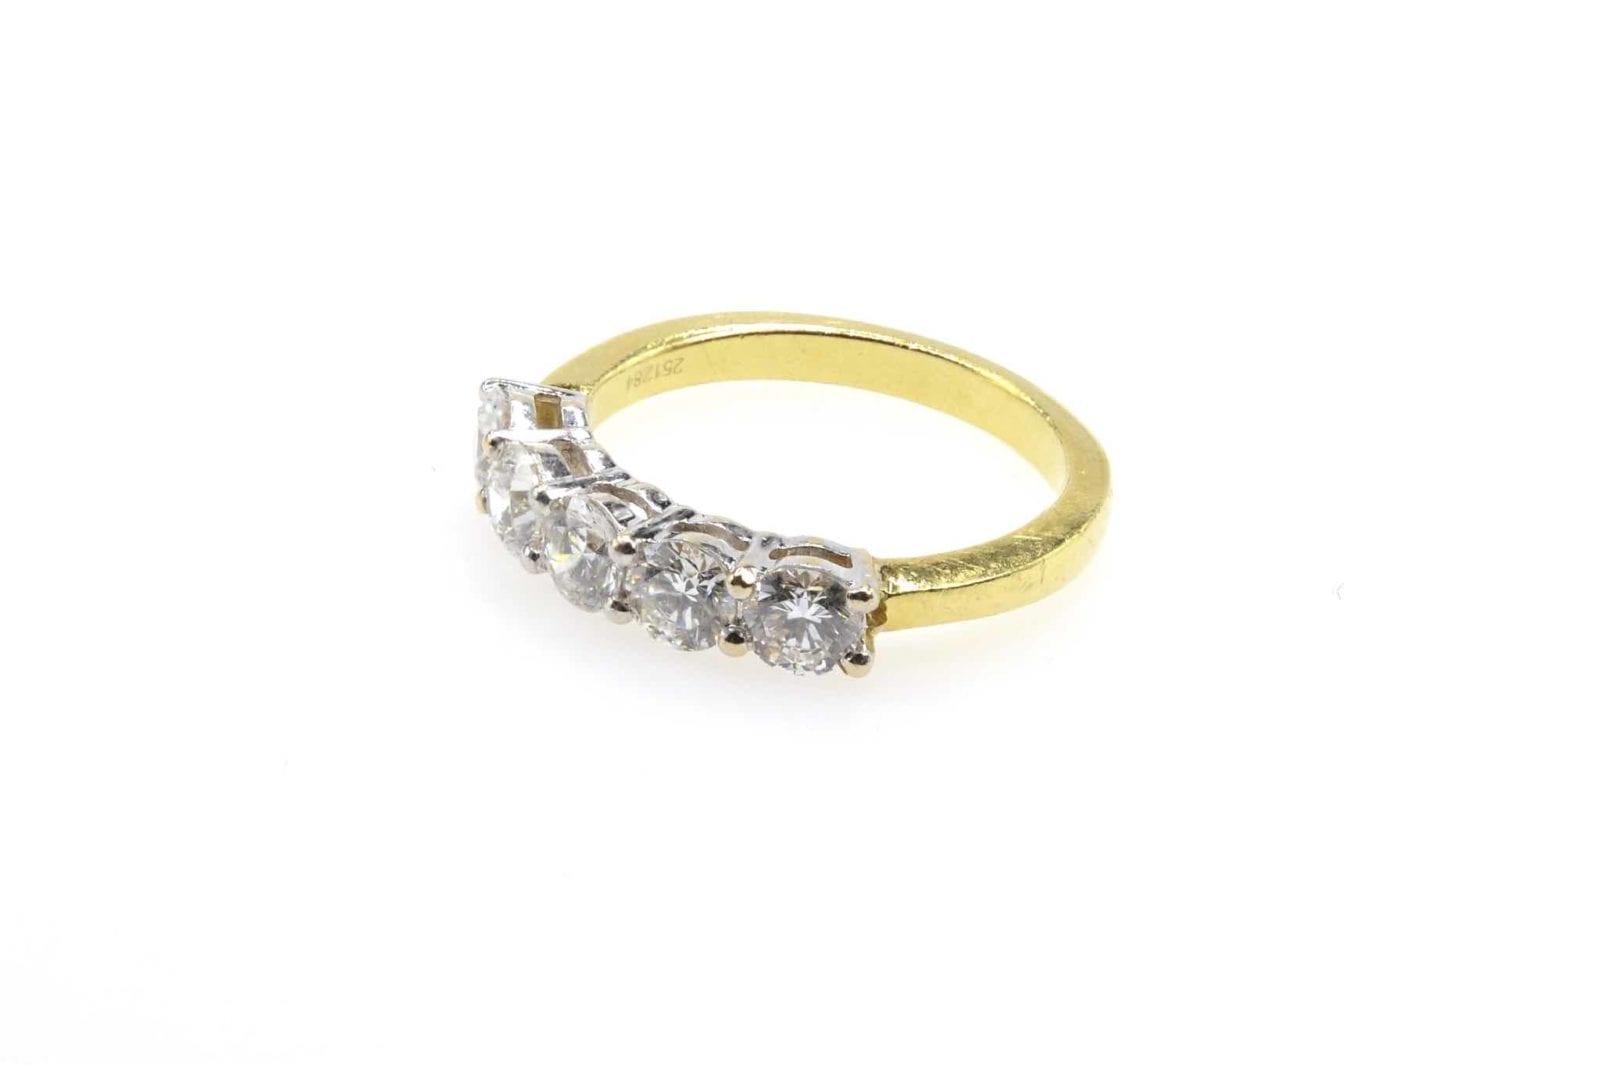 alliance diamants demi-tour en or jaune 18k